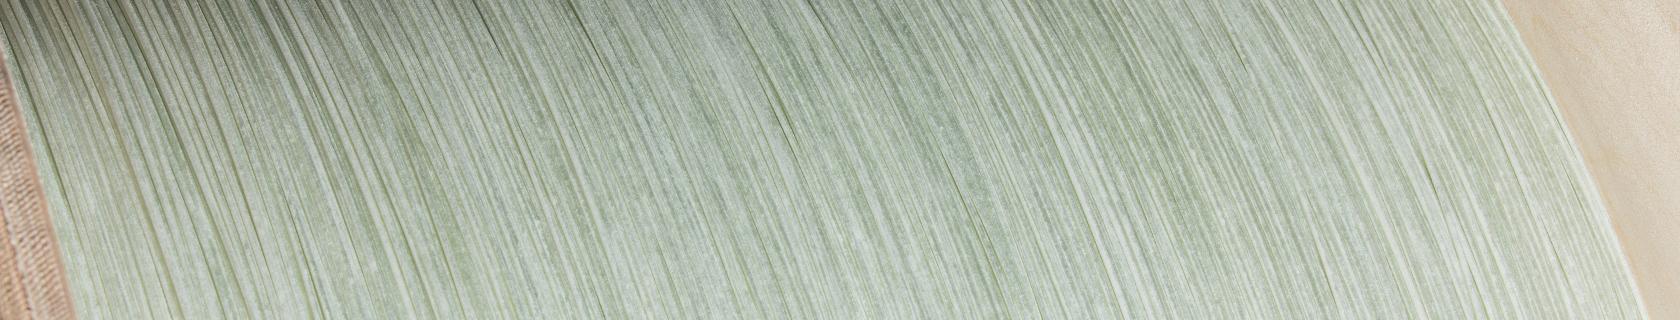 FIBER-LINE® Pultrusion: Composite Fiber Rods | FIBER-LINE®